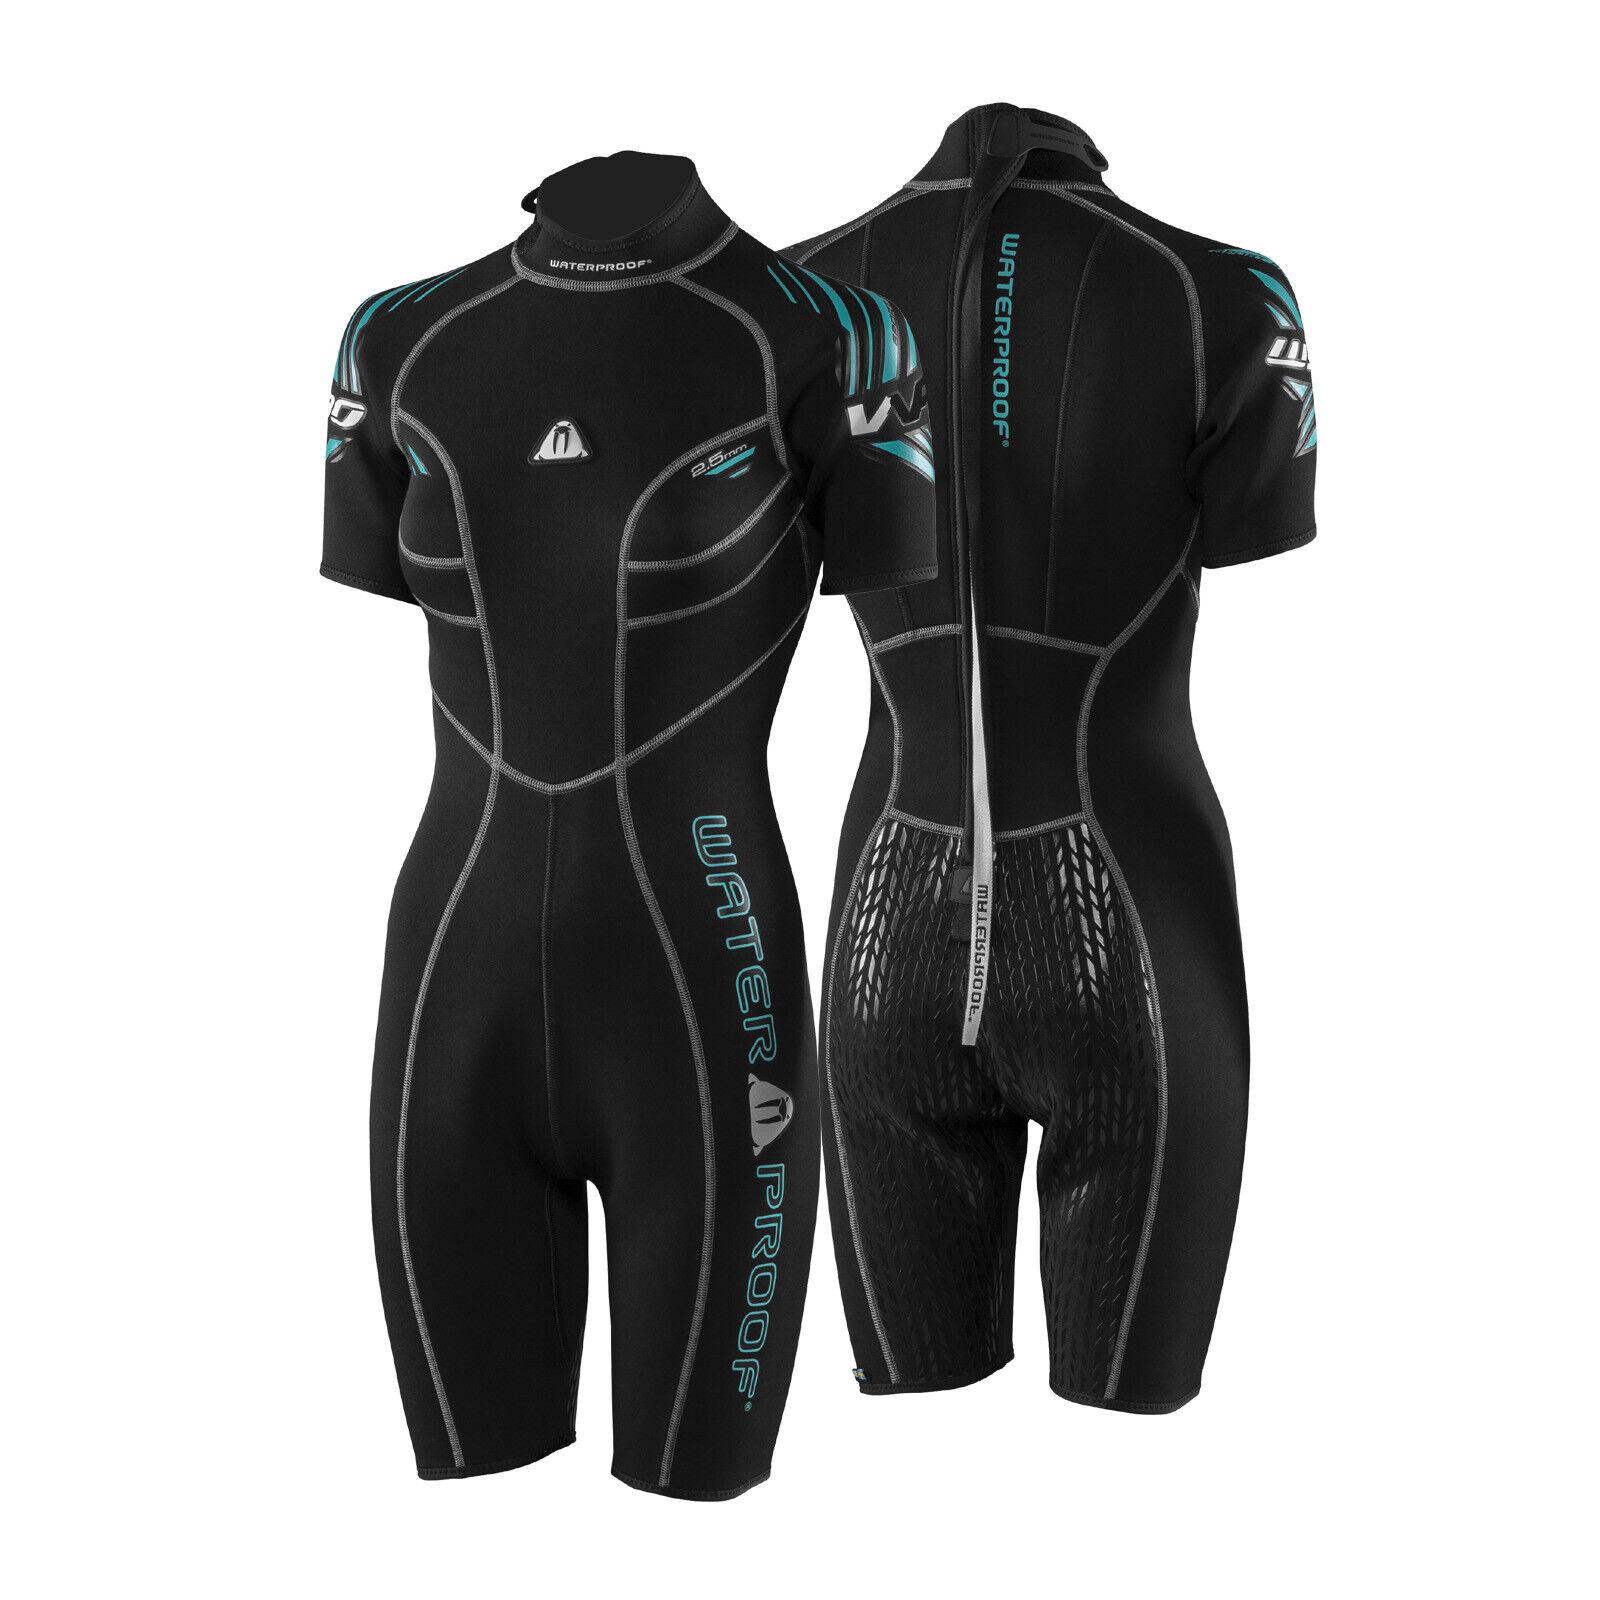 Waterpoof W30 Ladies Shorty 2,5mm - short Warm Water Wet Suit